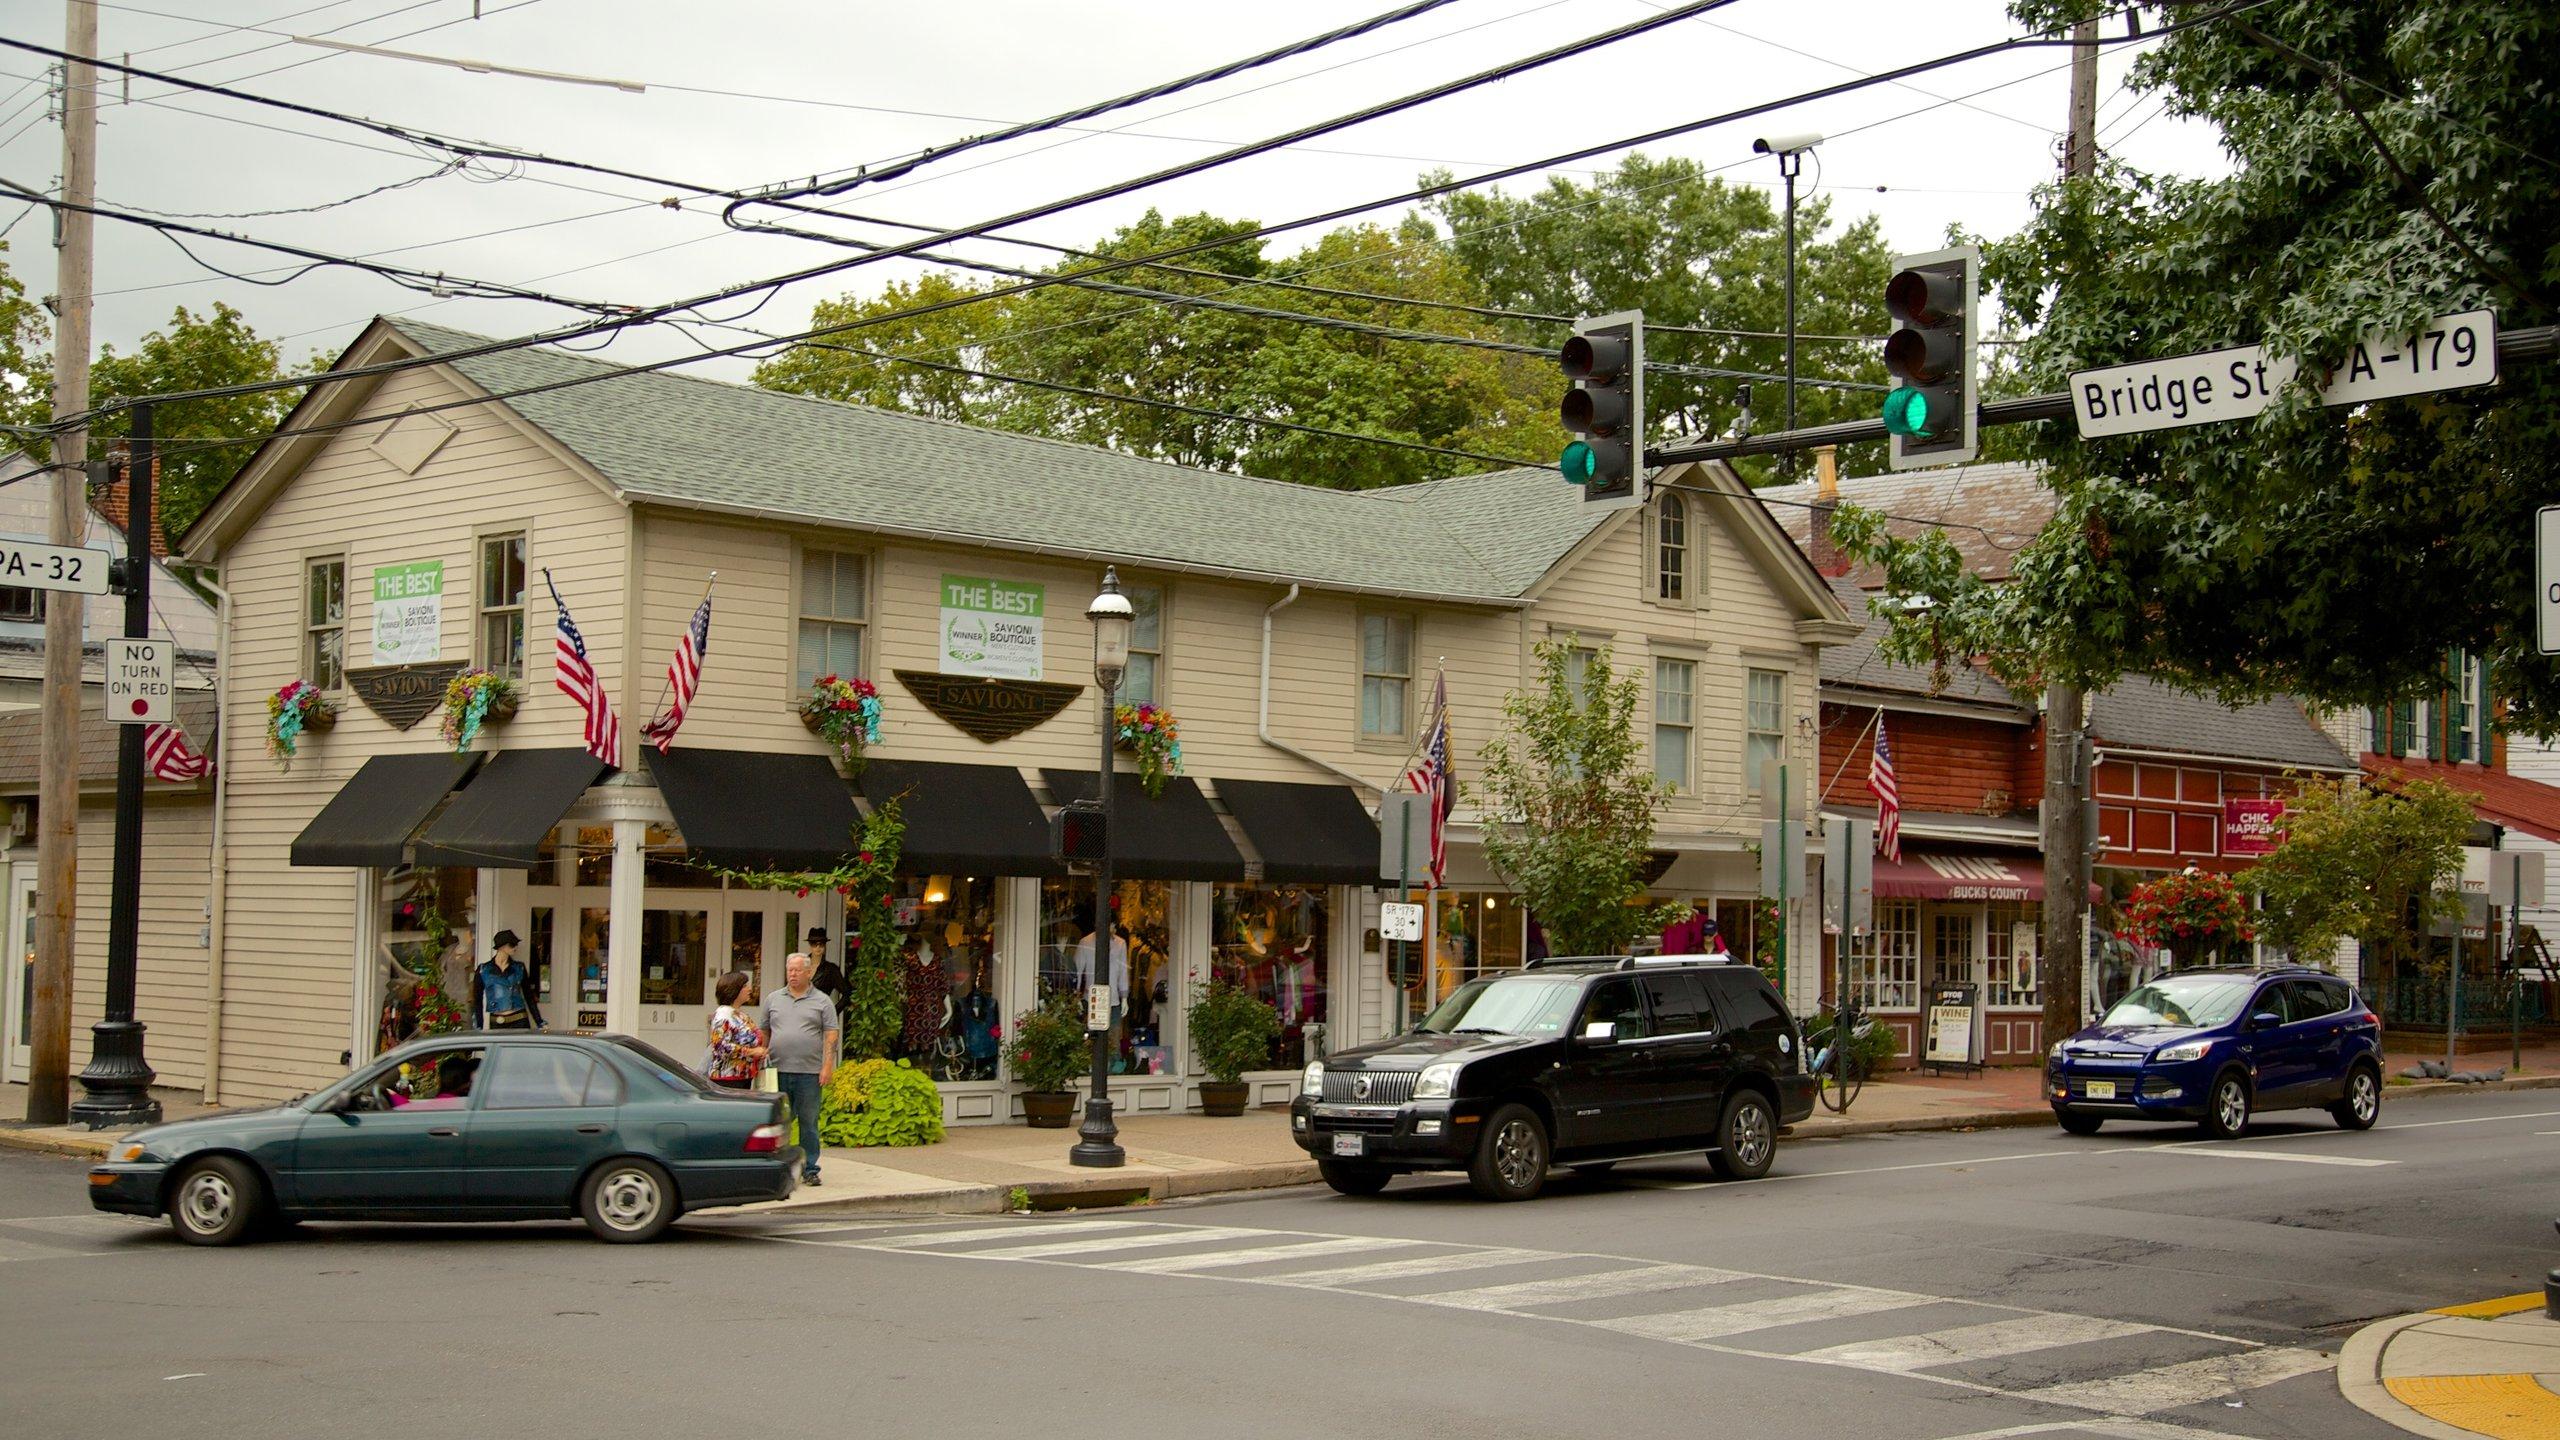 Bucks County, Pennsylvania, USA